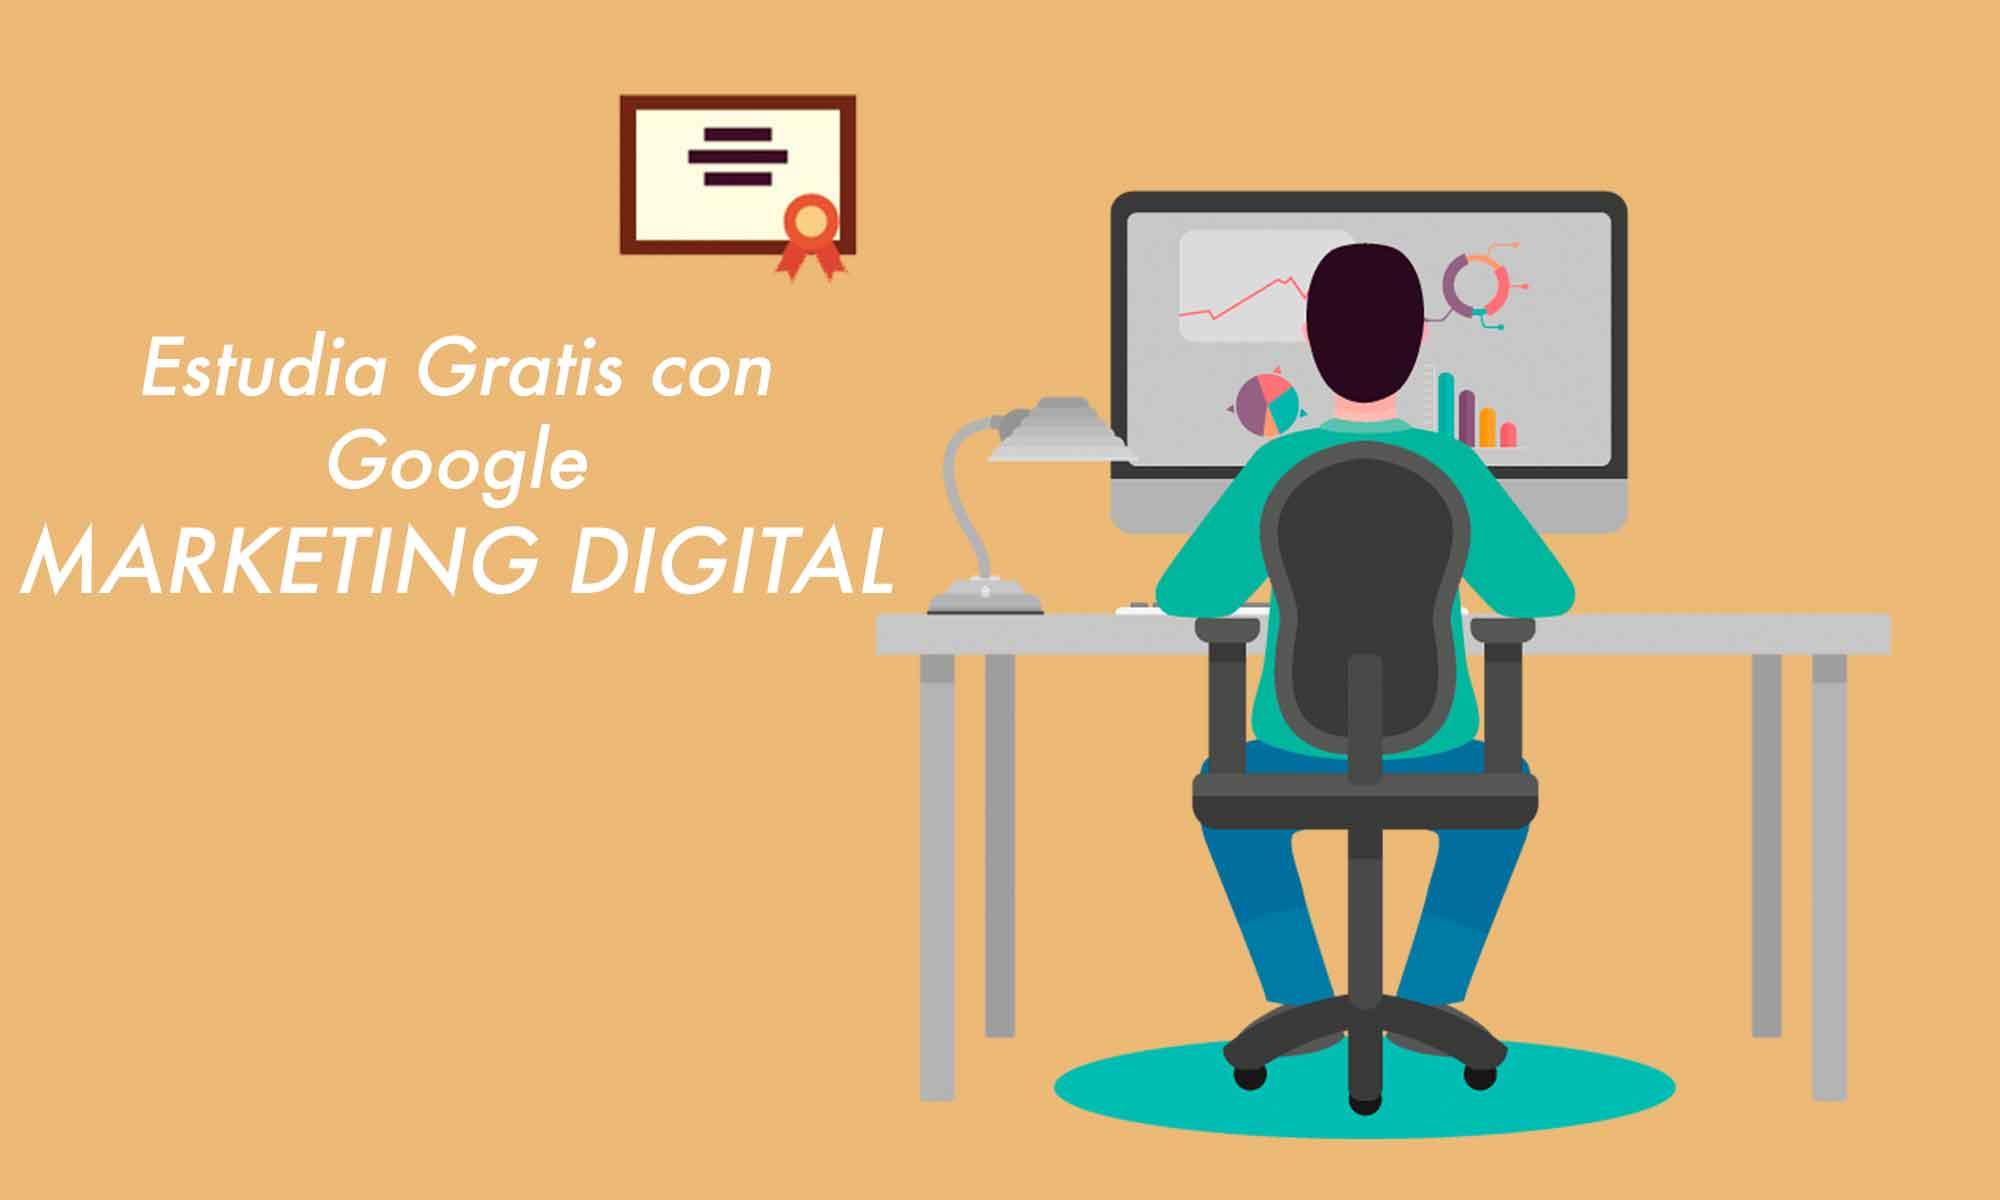 Garaje digital - aprende gratis con google